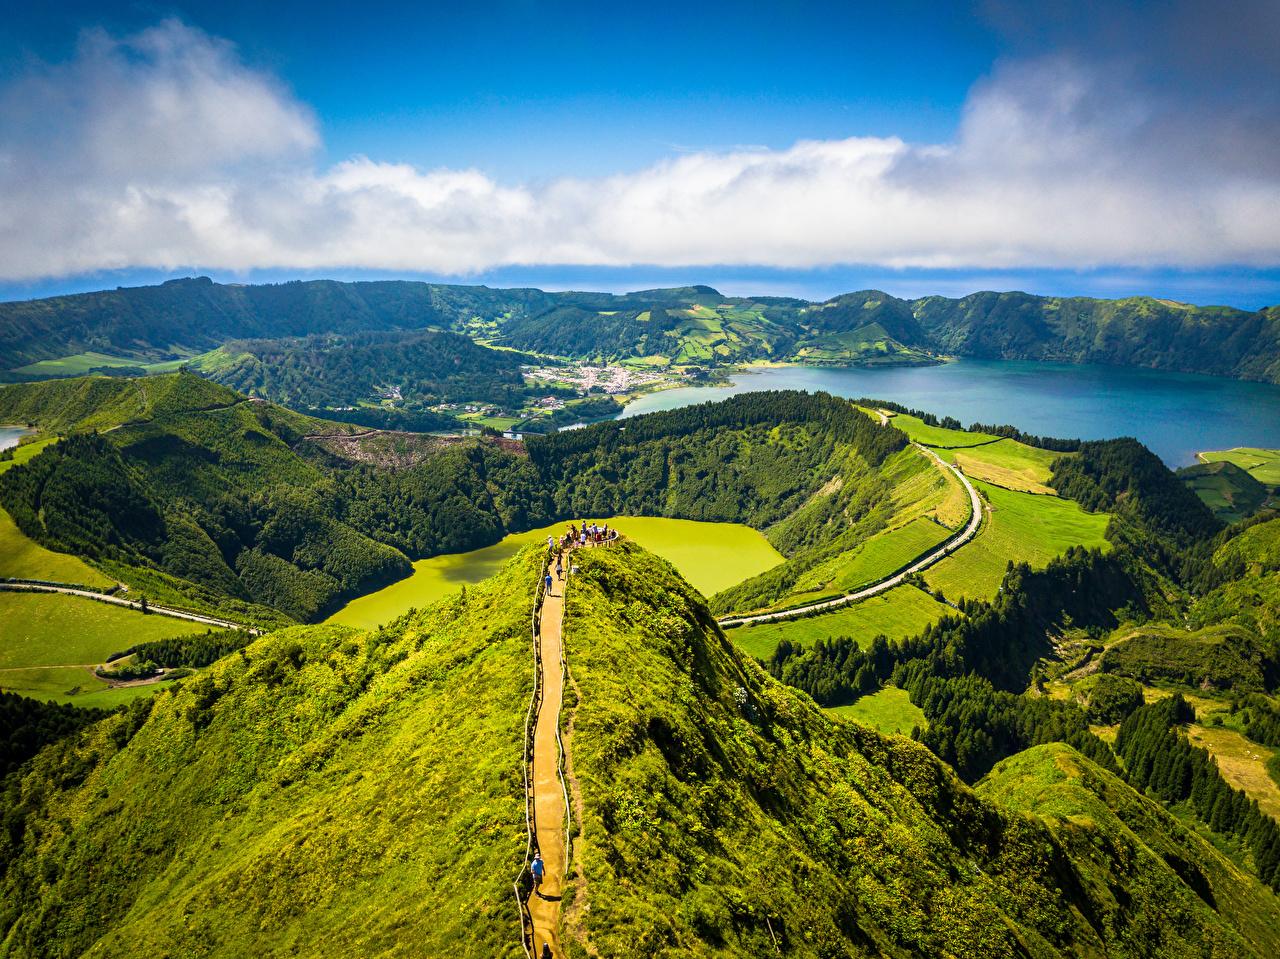 Фотографии Португалия Azores, Sete Cidades, Miradouro da Boca do Inferno Горы Природа лес берег Сверху облачно гора Леса Побережье Облака облако